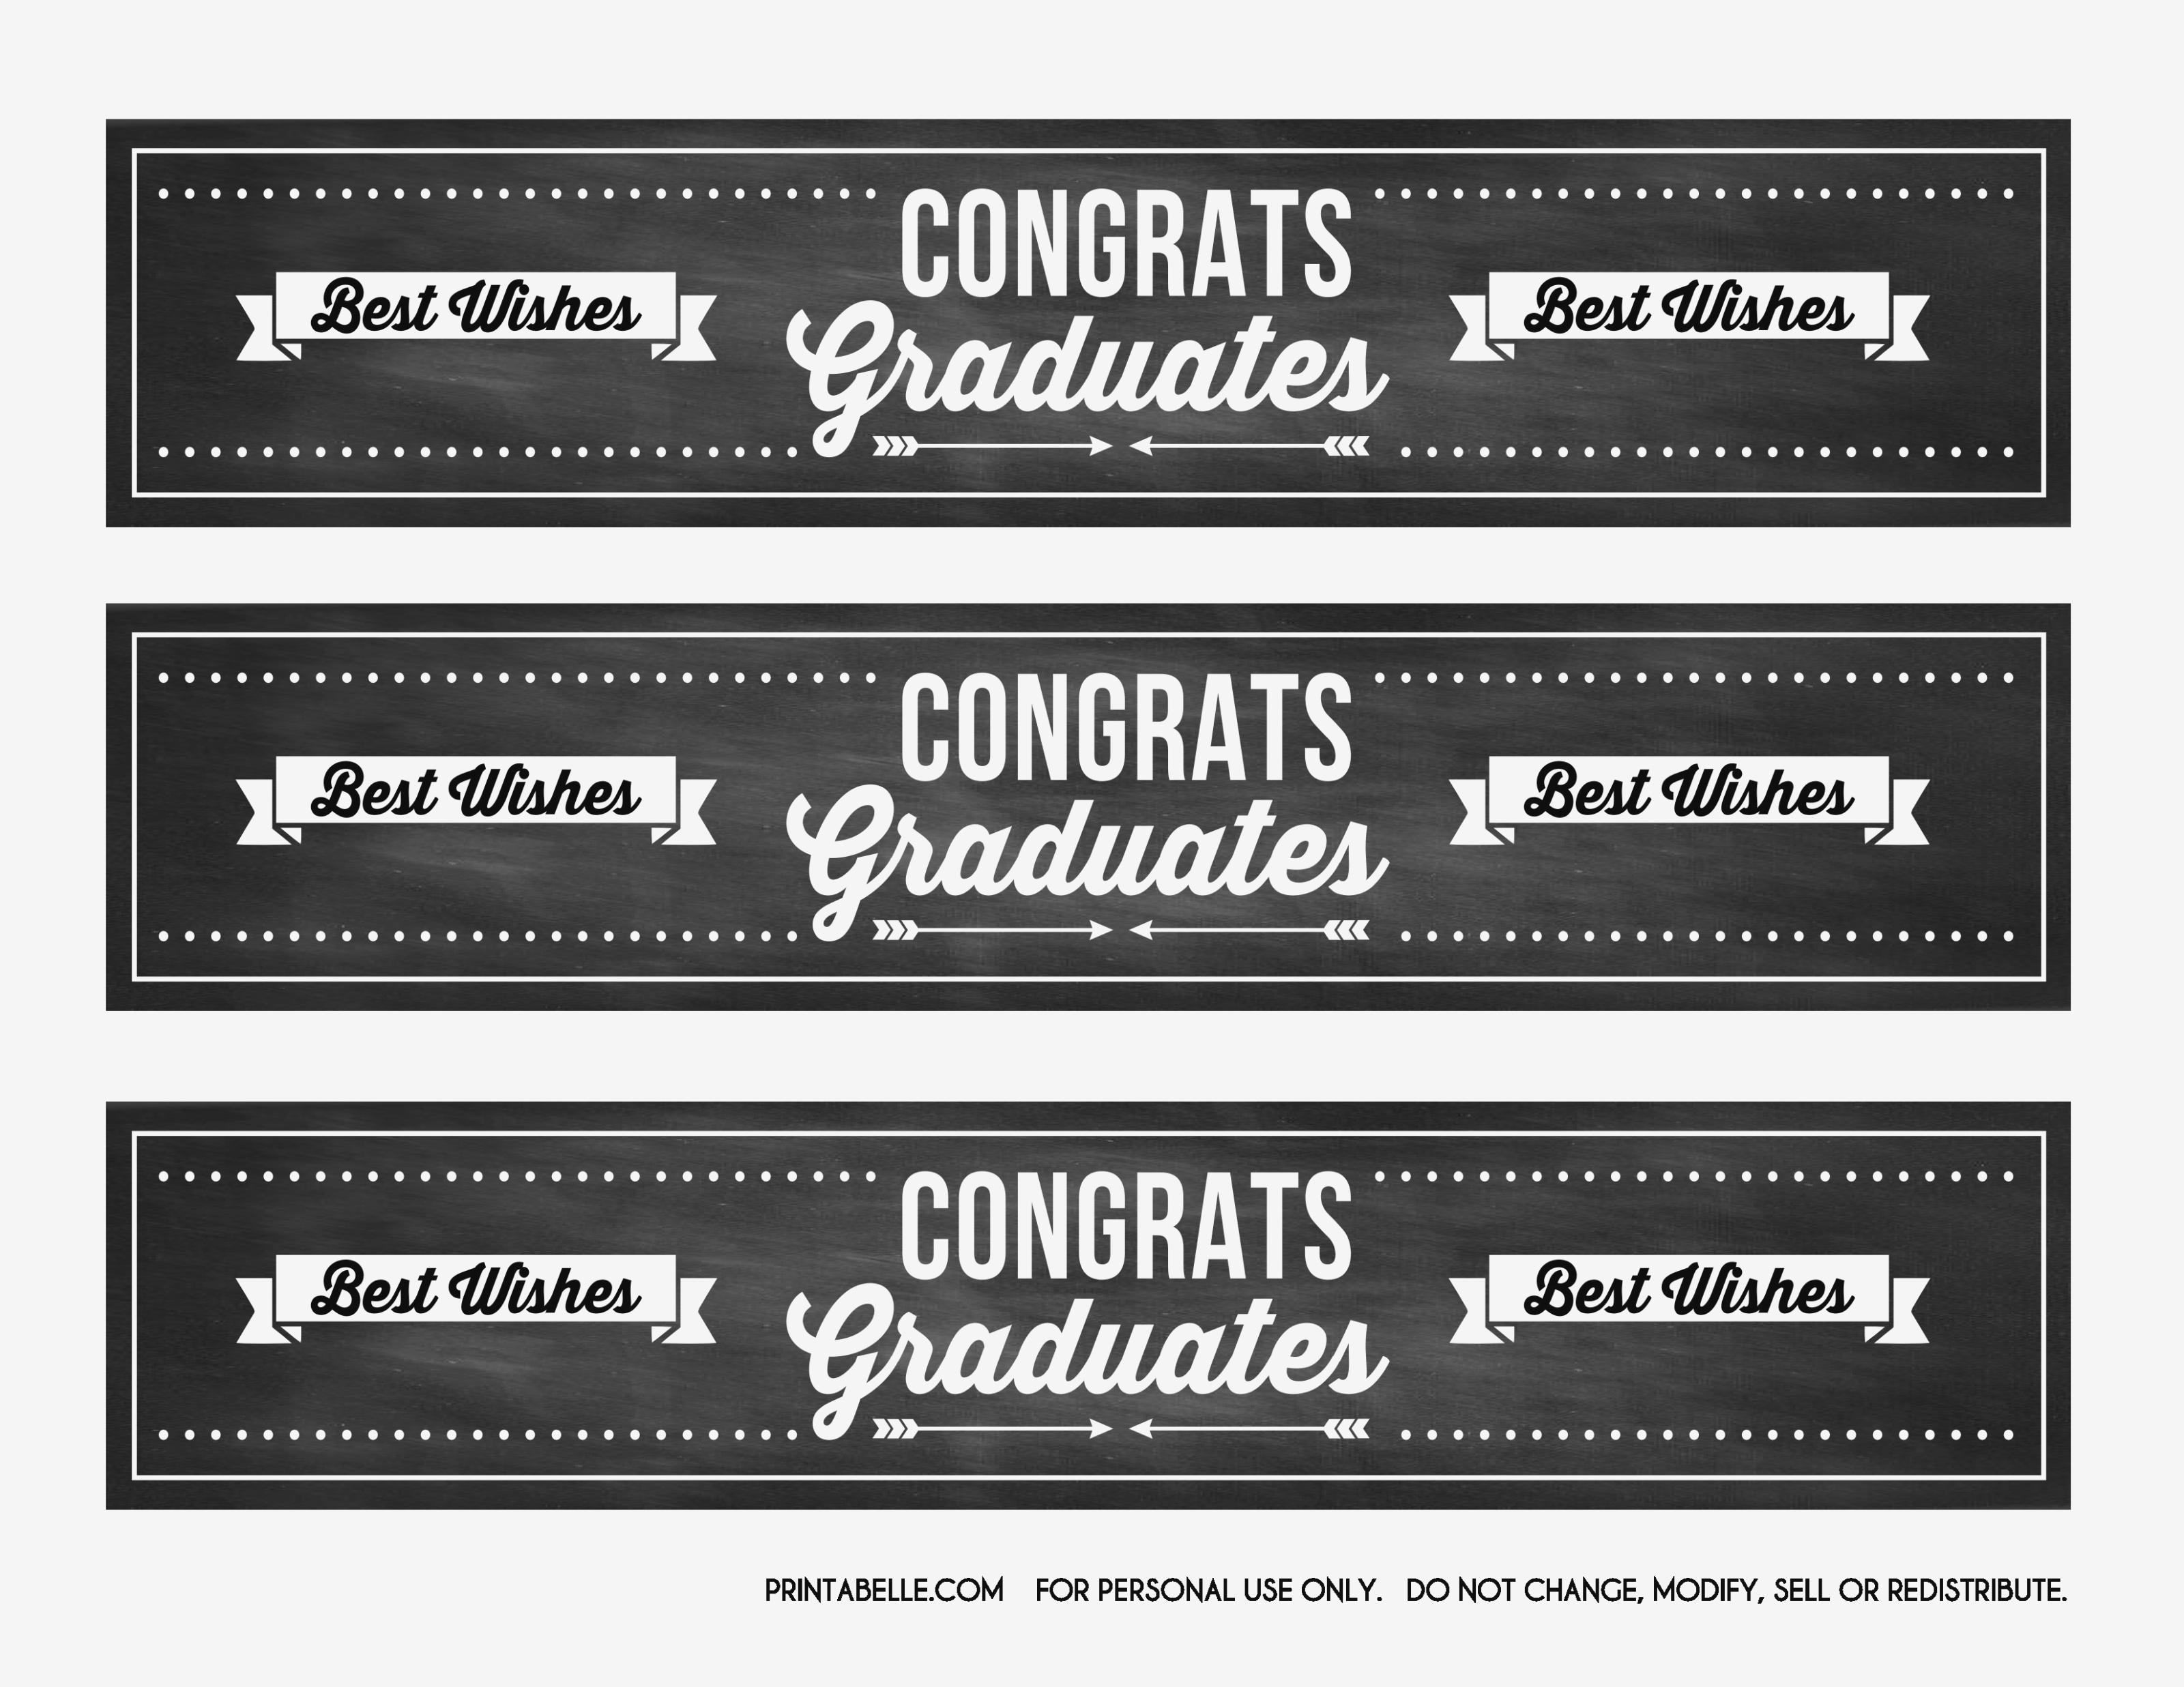 Free Printable Label Templates 15   Printable And Formats - Free Printable Graduation Address Labels